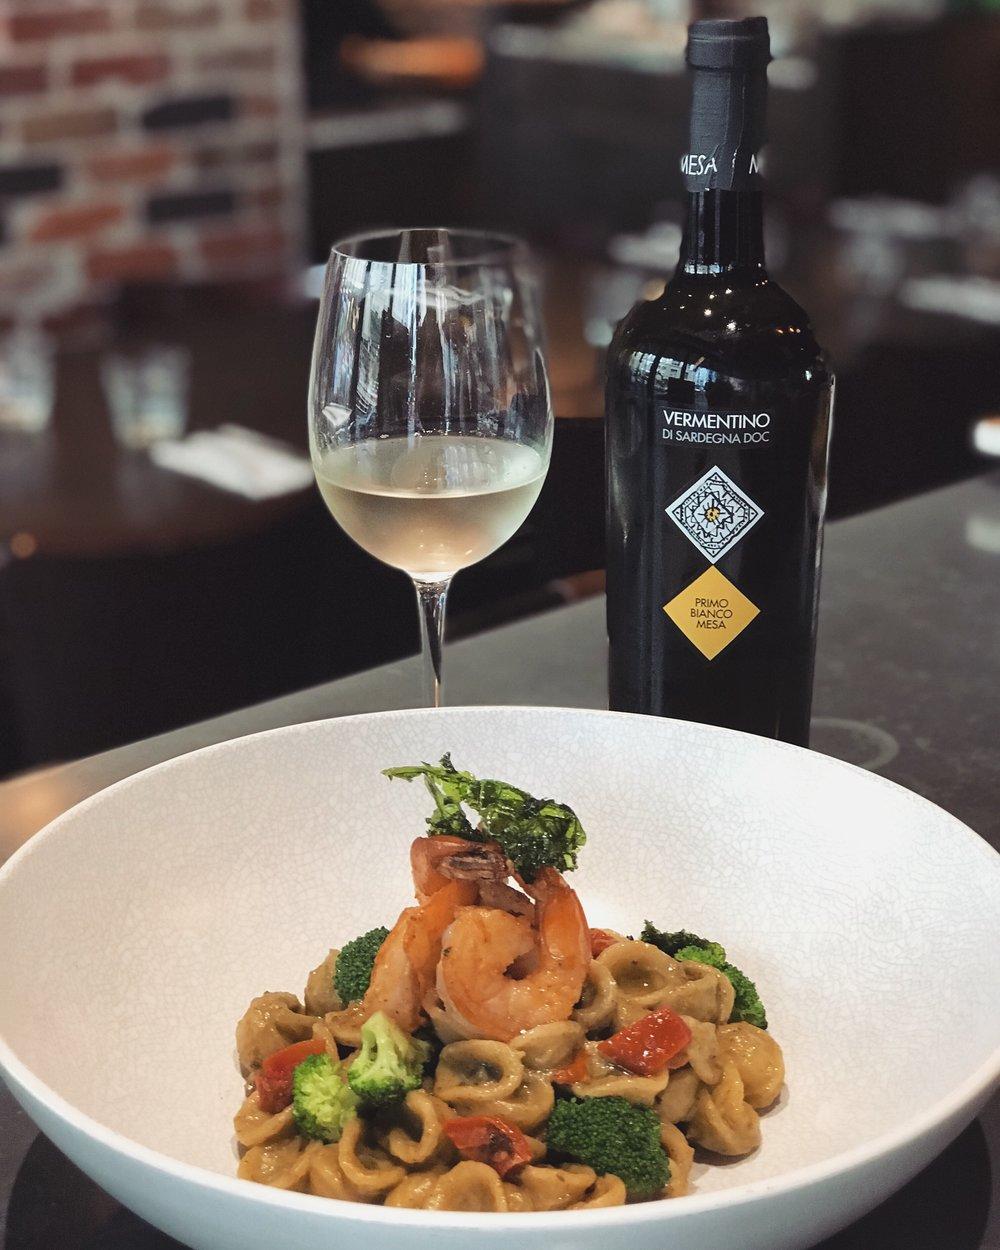 17-28 April - ~ Orecchiette Gamberetti & Broccoli ~⠀⠀Hand crafted orecchiette with prawns, broccoli, cream and thyme.⠀⠀Recommended with a glass of Vermentino.